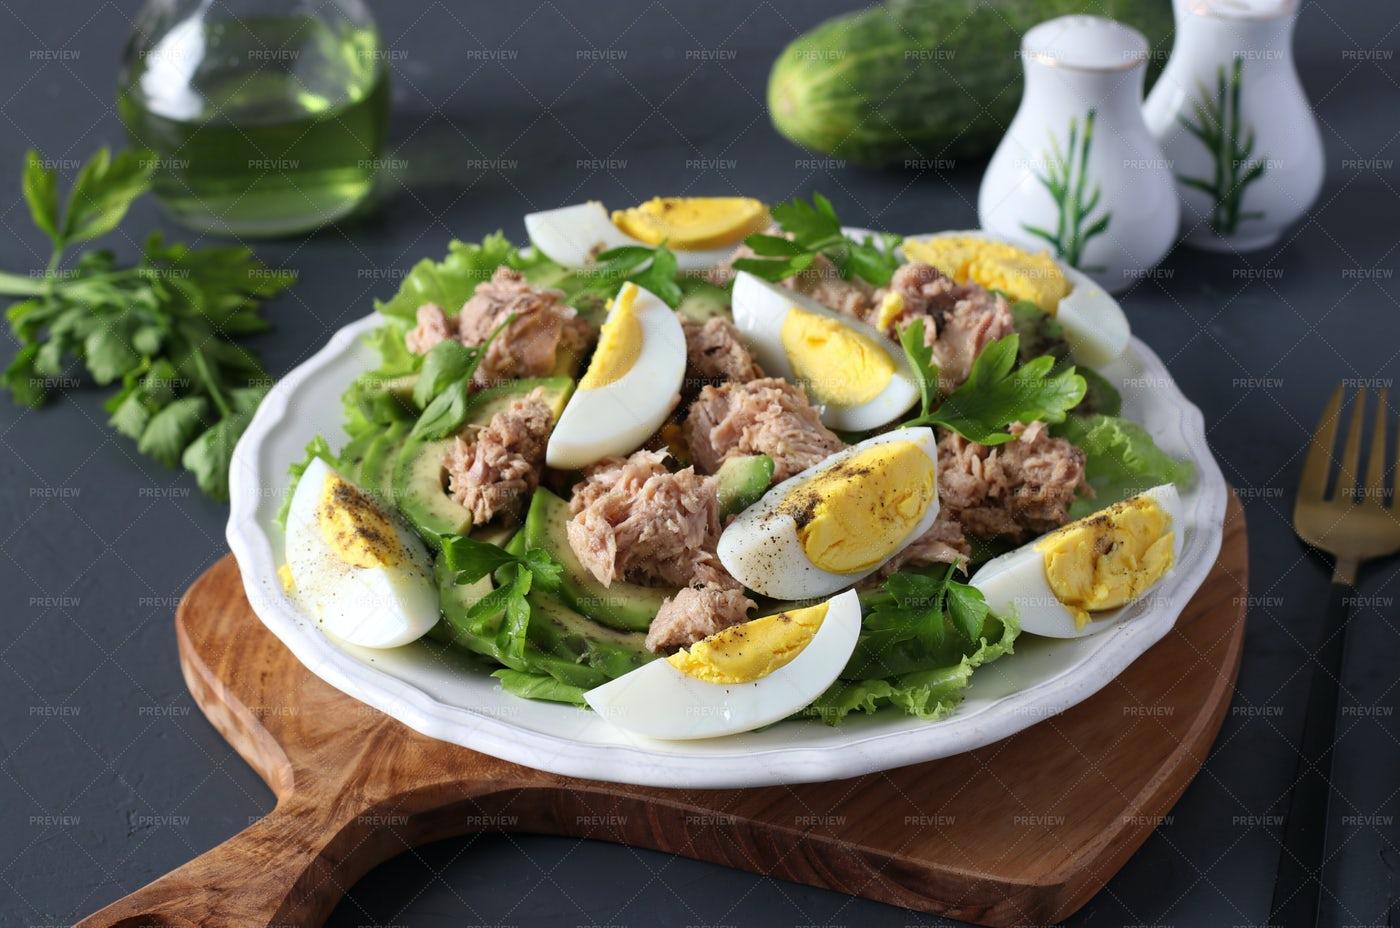 Salad With Avocado And Tuna: Stock Photos